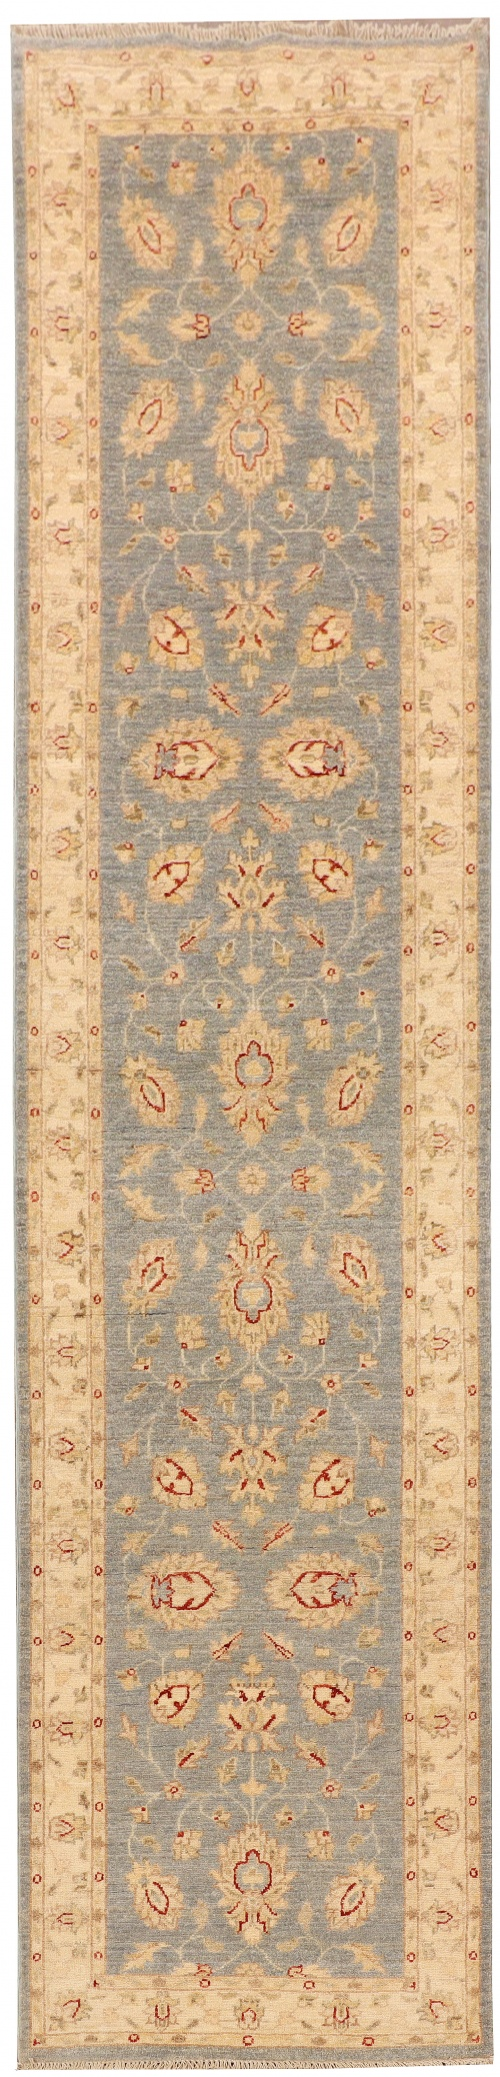 Rug# 26315, Afghan Turkaman,19th c Ziegler inspired, Size 324x78 cm